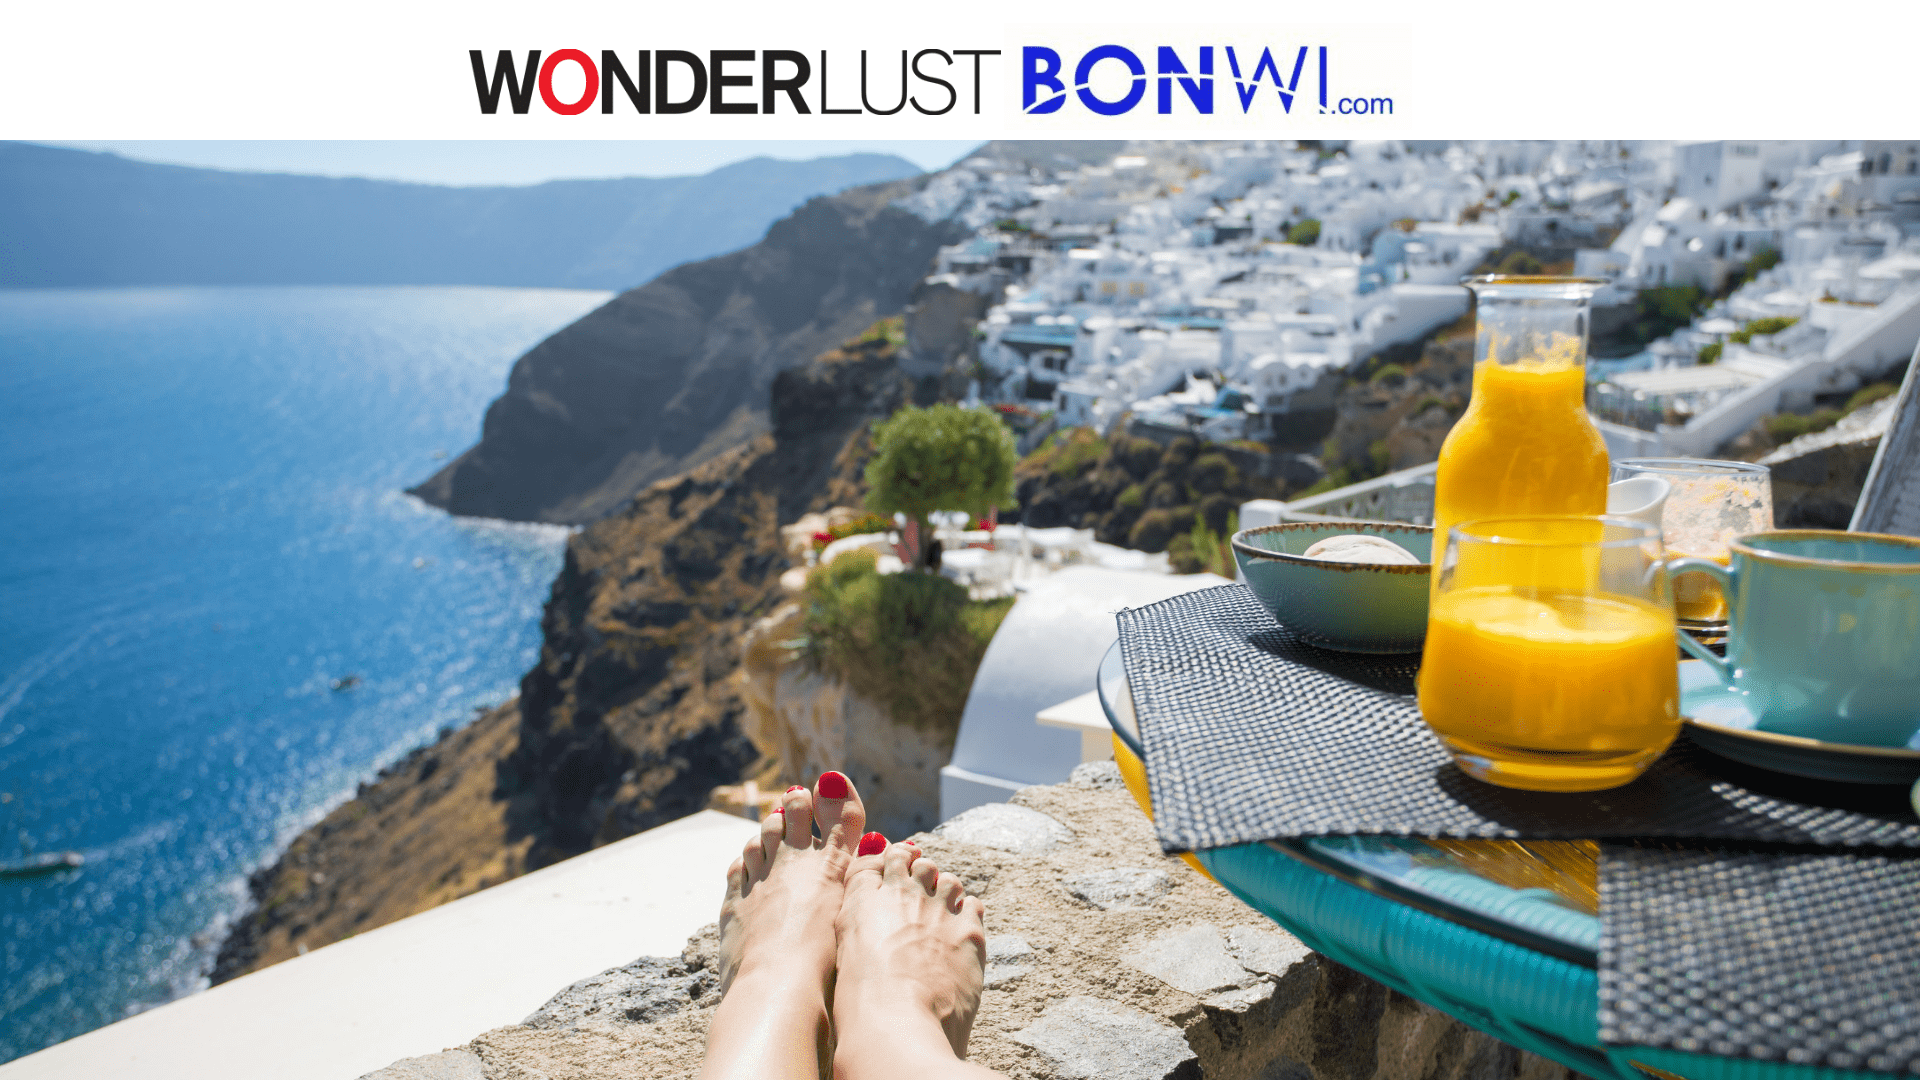 Wonderlust-Bonwi-min.png